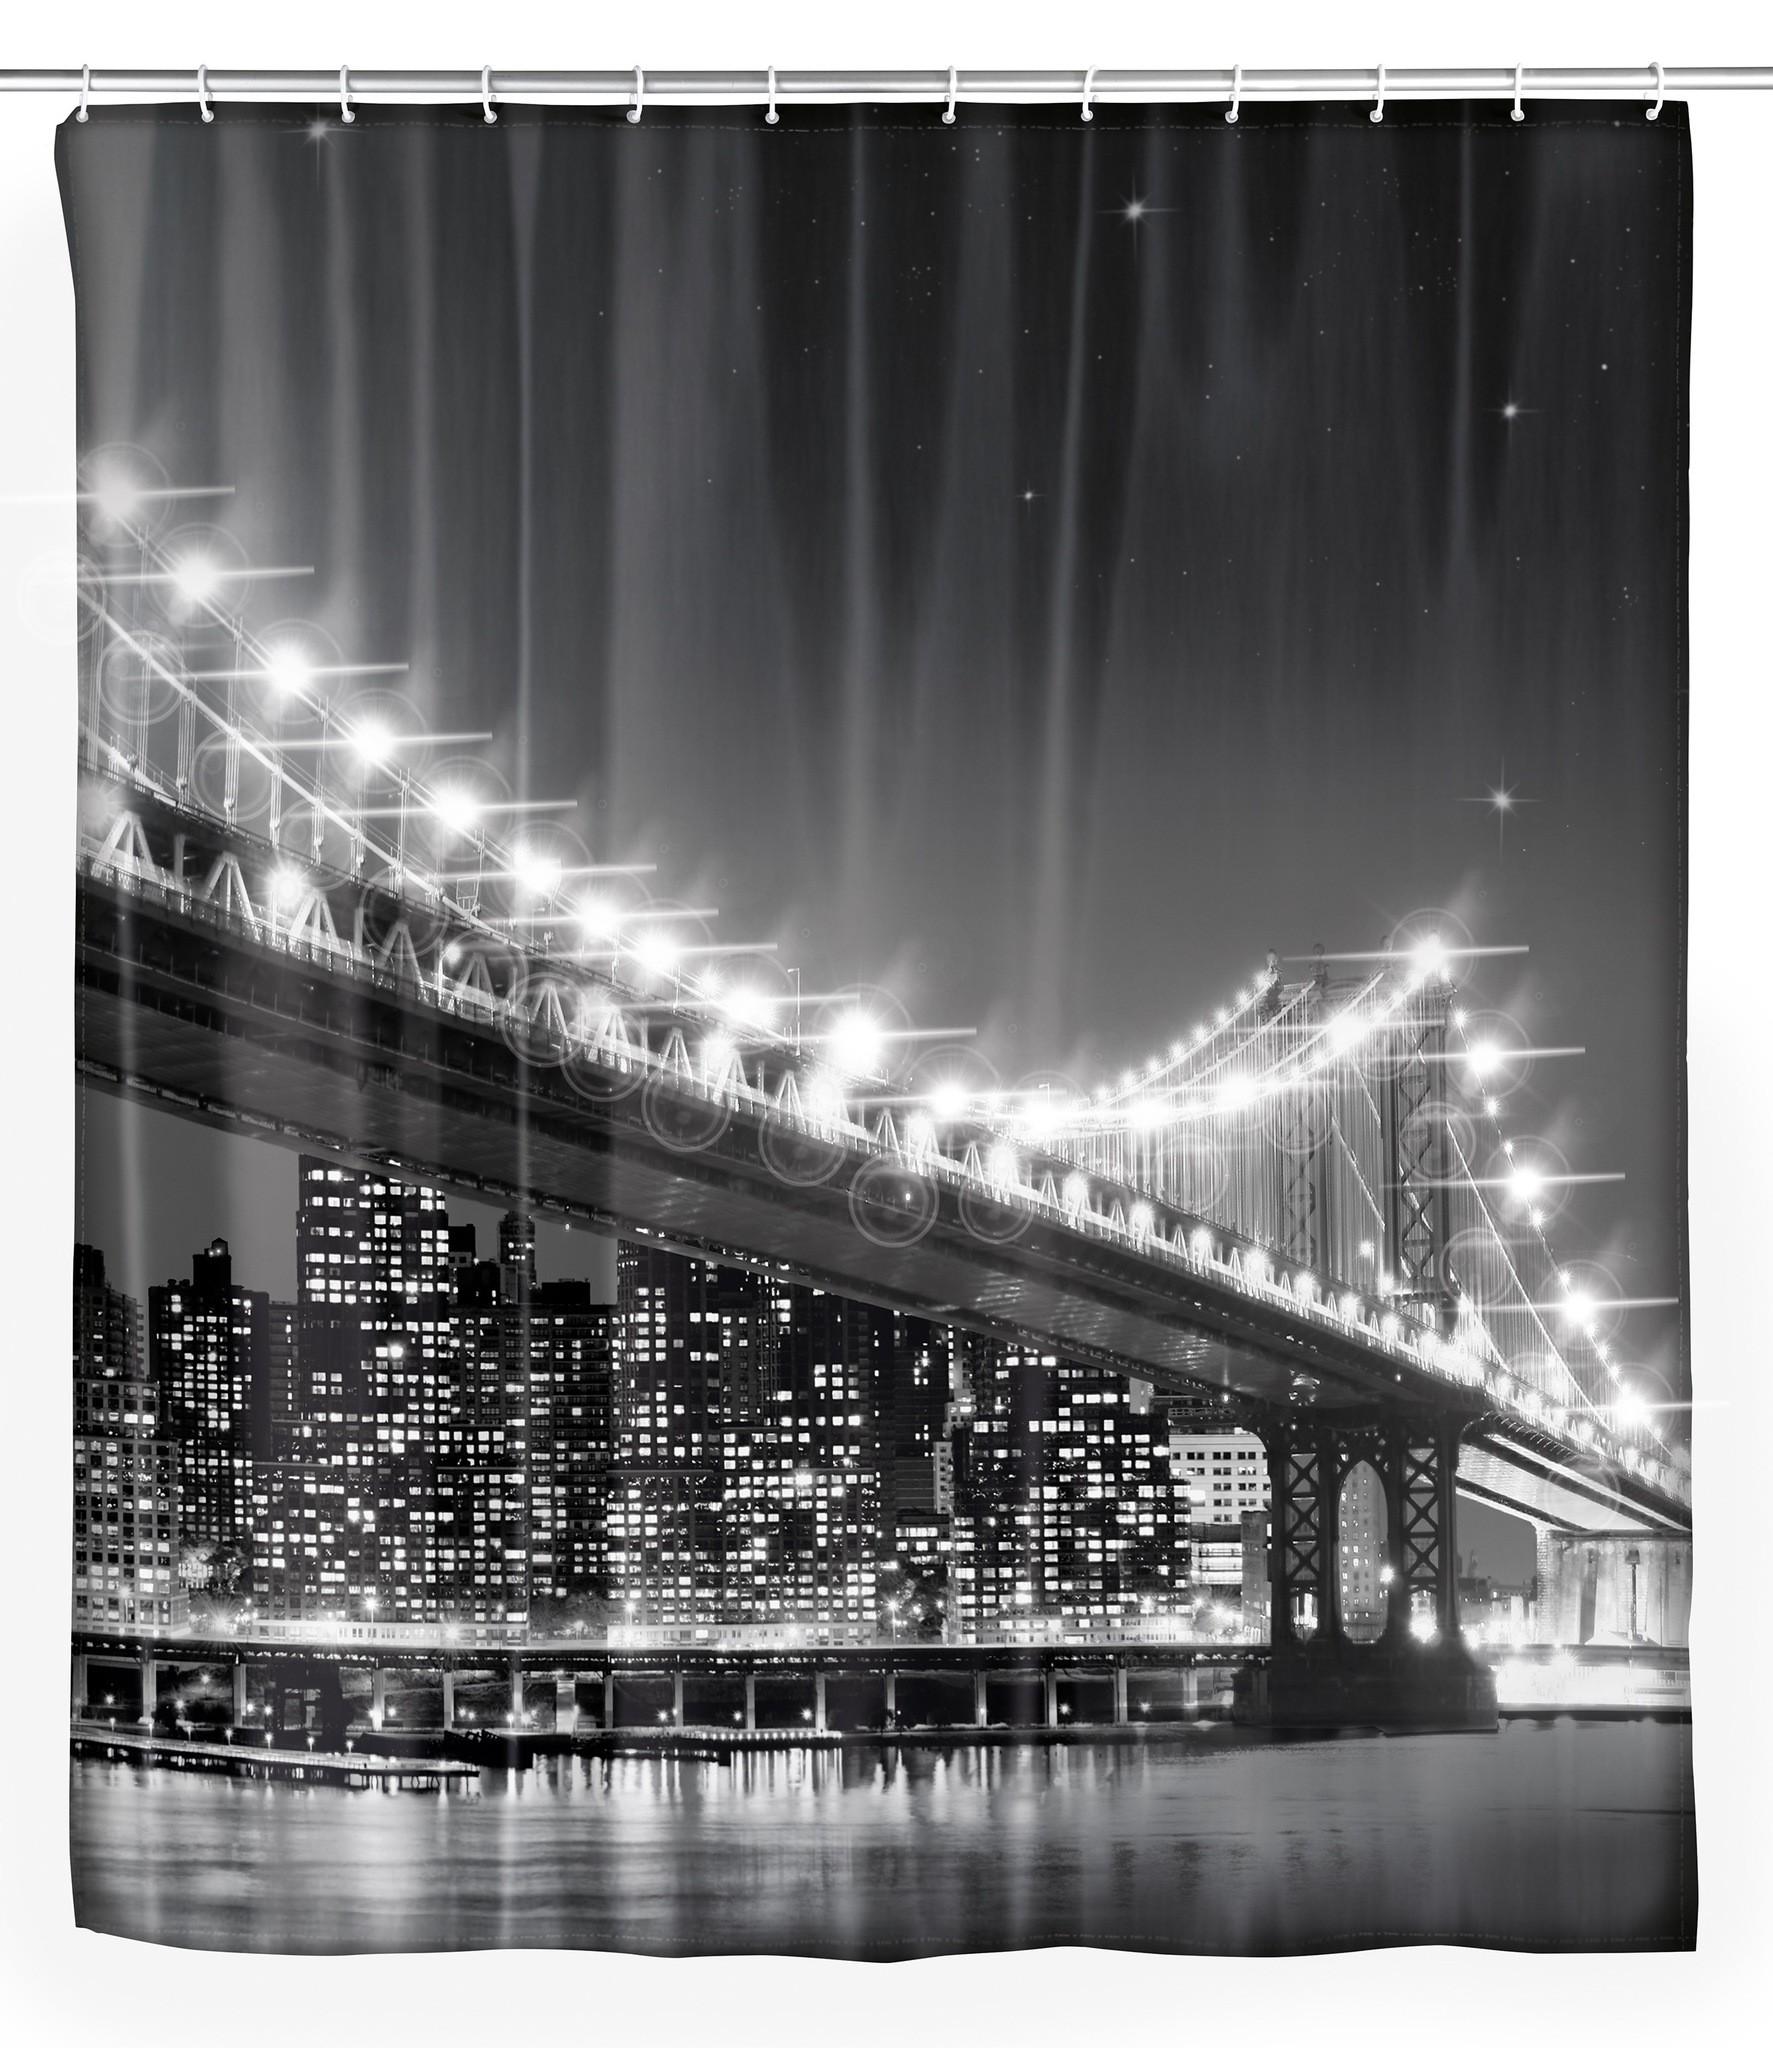 Wenko LED Duschvorhang Brooklyn Bridge, 180 x 200 cm, waschbar